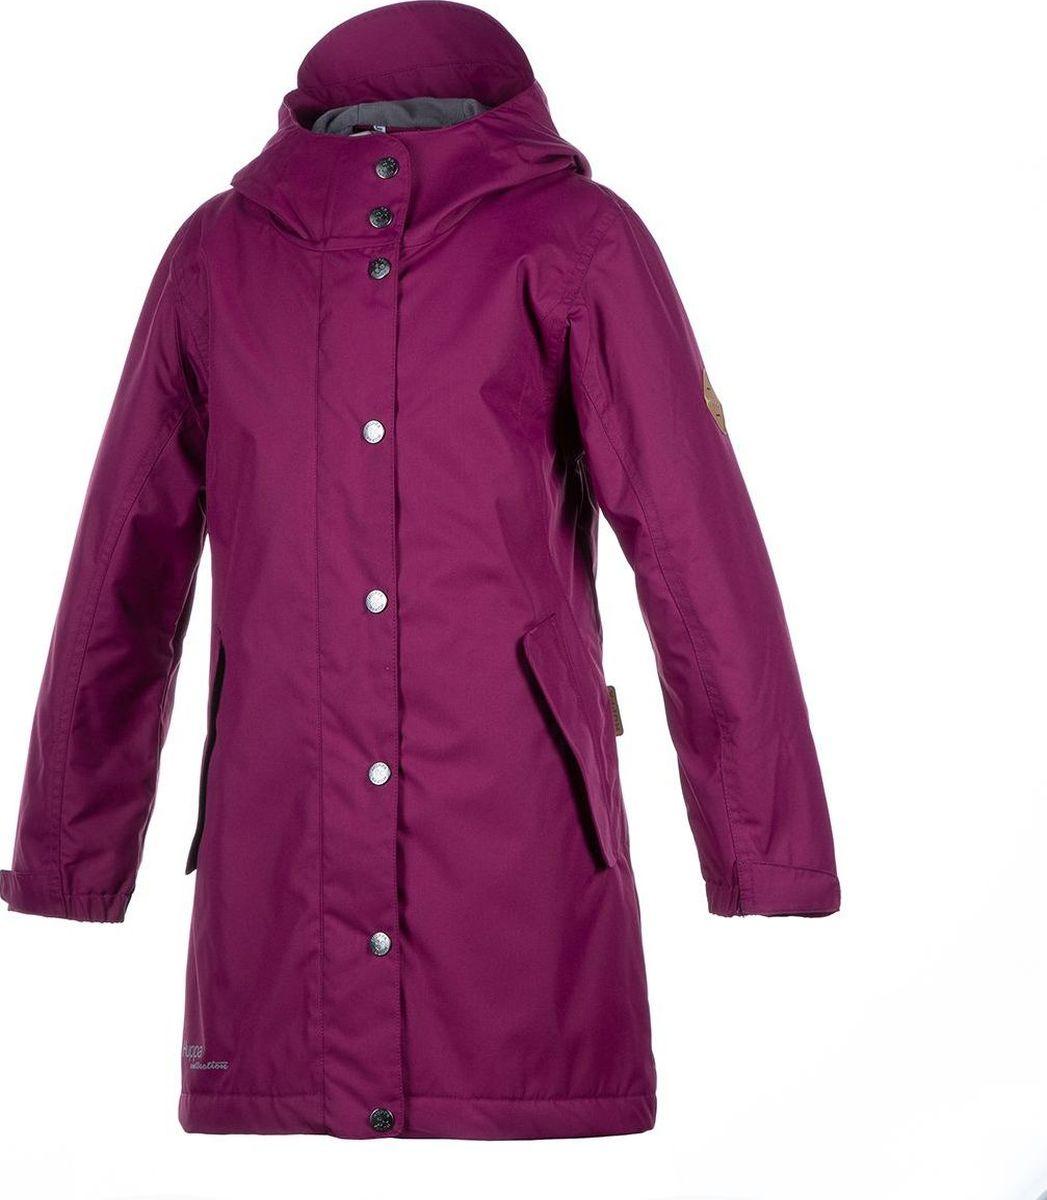 Куртка Huppa куртка для девочки huppa june 2 цвет фуксия 17880204 91263 размер 110